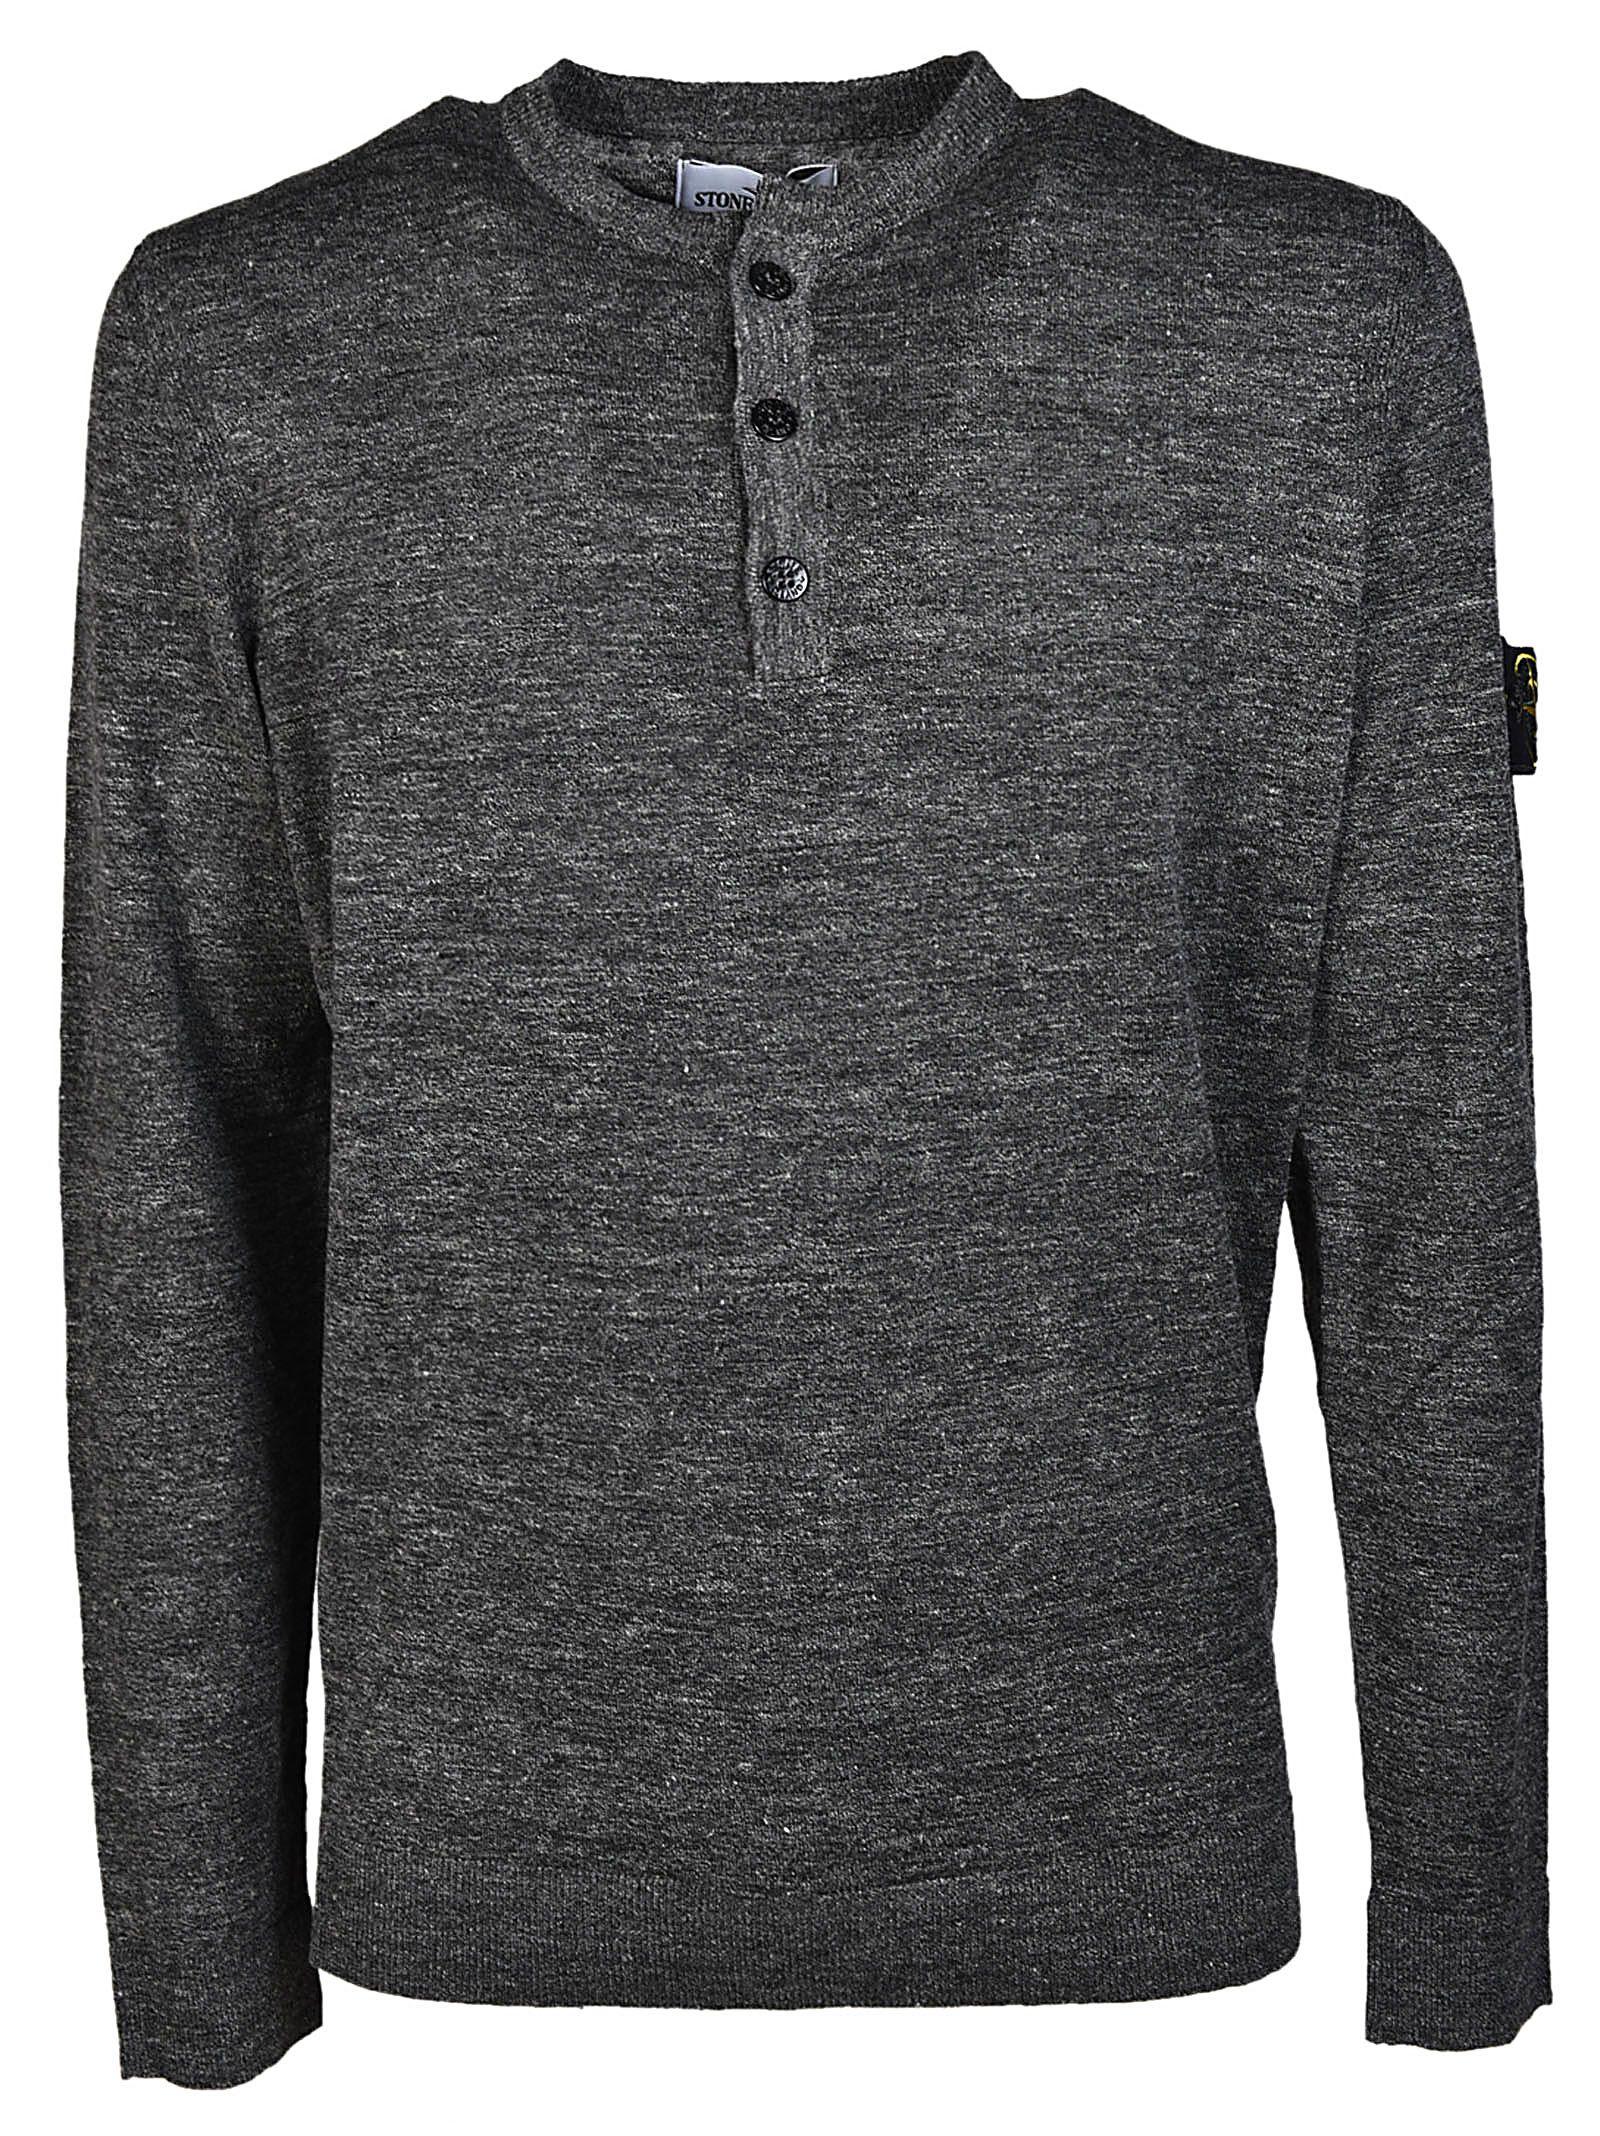 Stone Island Buttoned Sweatshirt